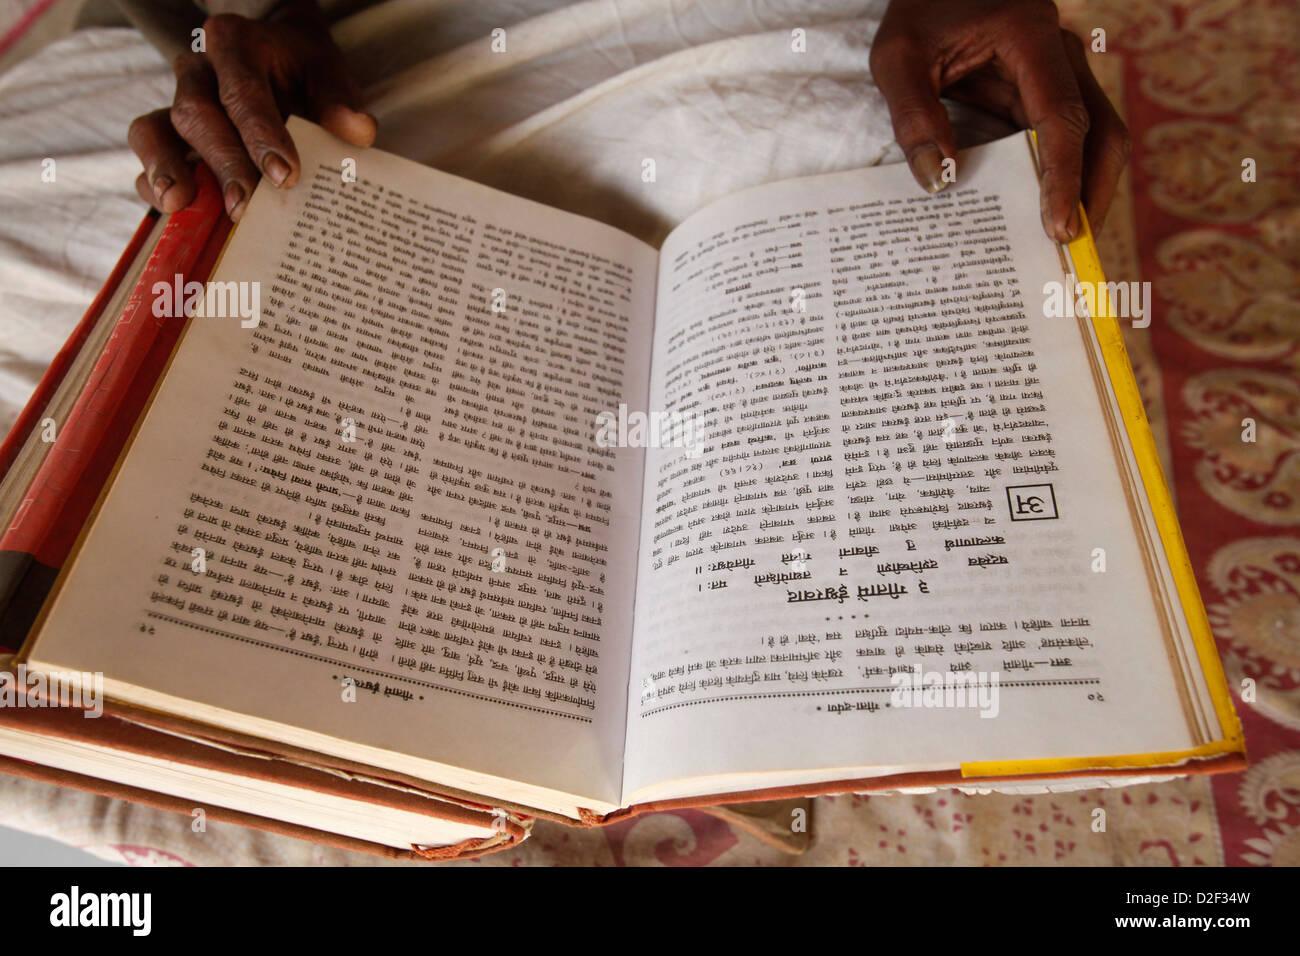 Temple priest reading the Bhagavad Gita Goverdan. India. - Stock Image